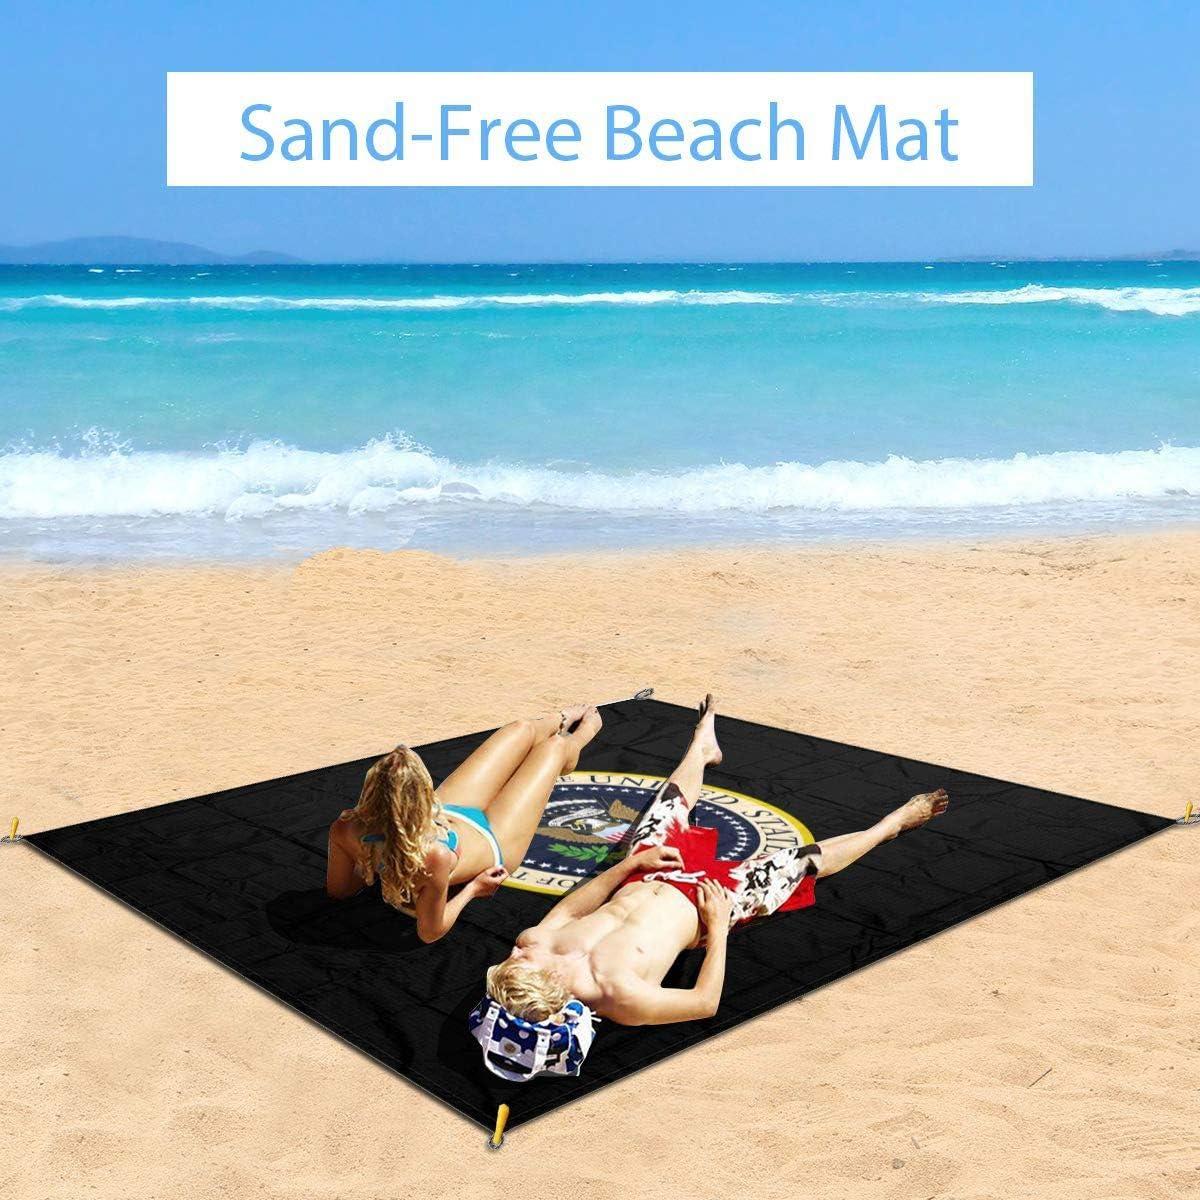 wasserdichte Strandmatte faltbare Outdoor-Teppich WGYWE Seal-President-Of-The-United-States Tragbare Picknick-Decken